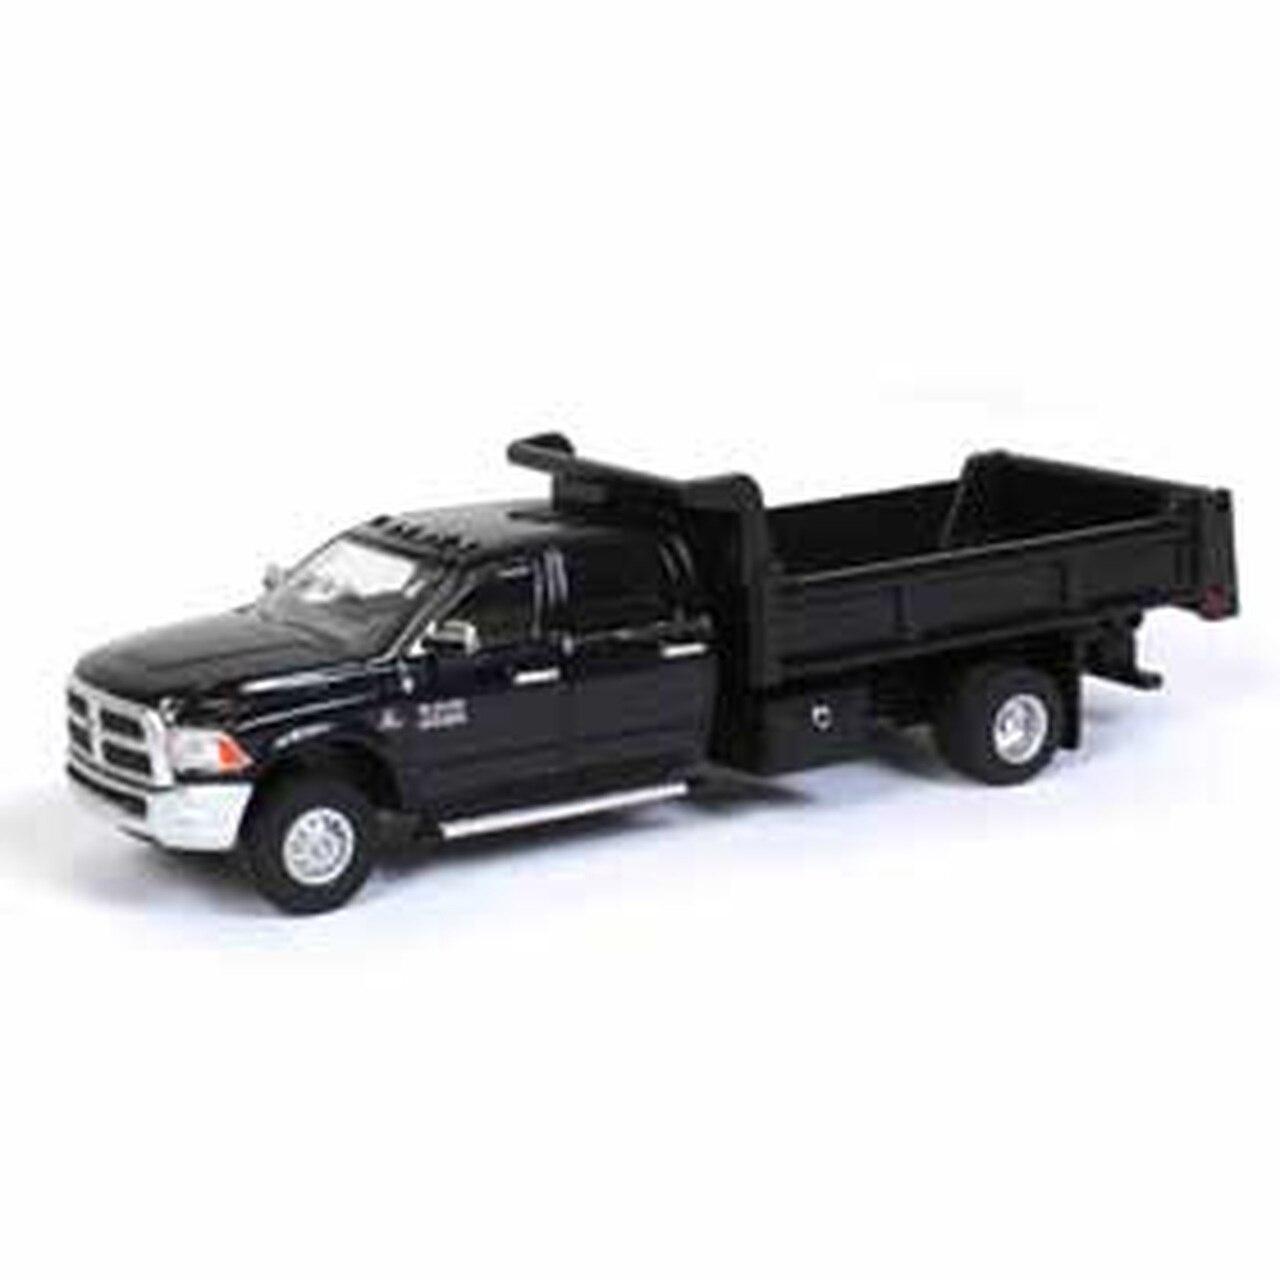 Metal Car Truck - 1:64 2018 Ram 3500 Laramie Dually Outback Exclusive